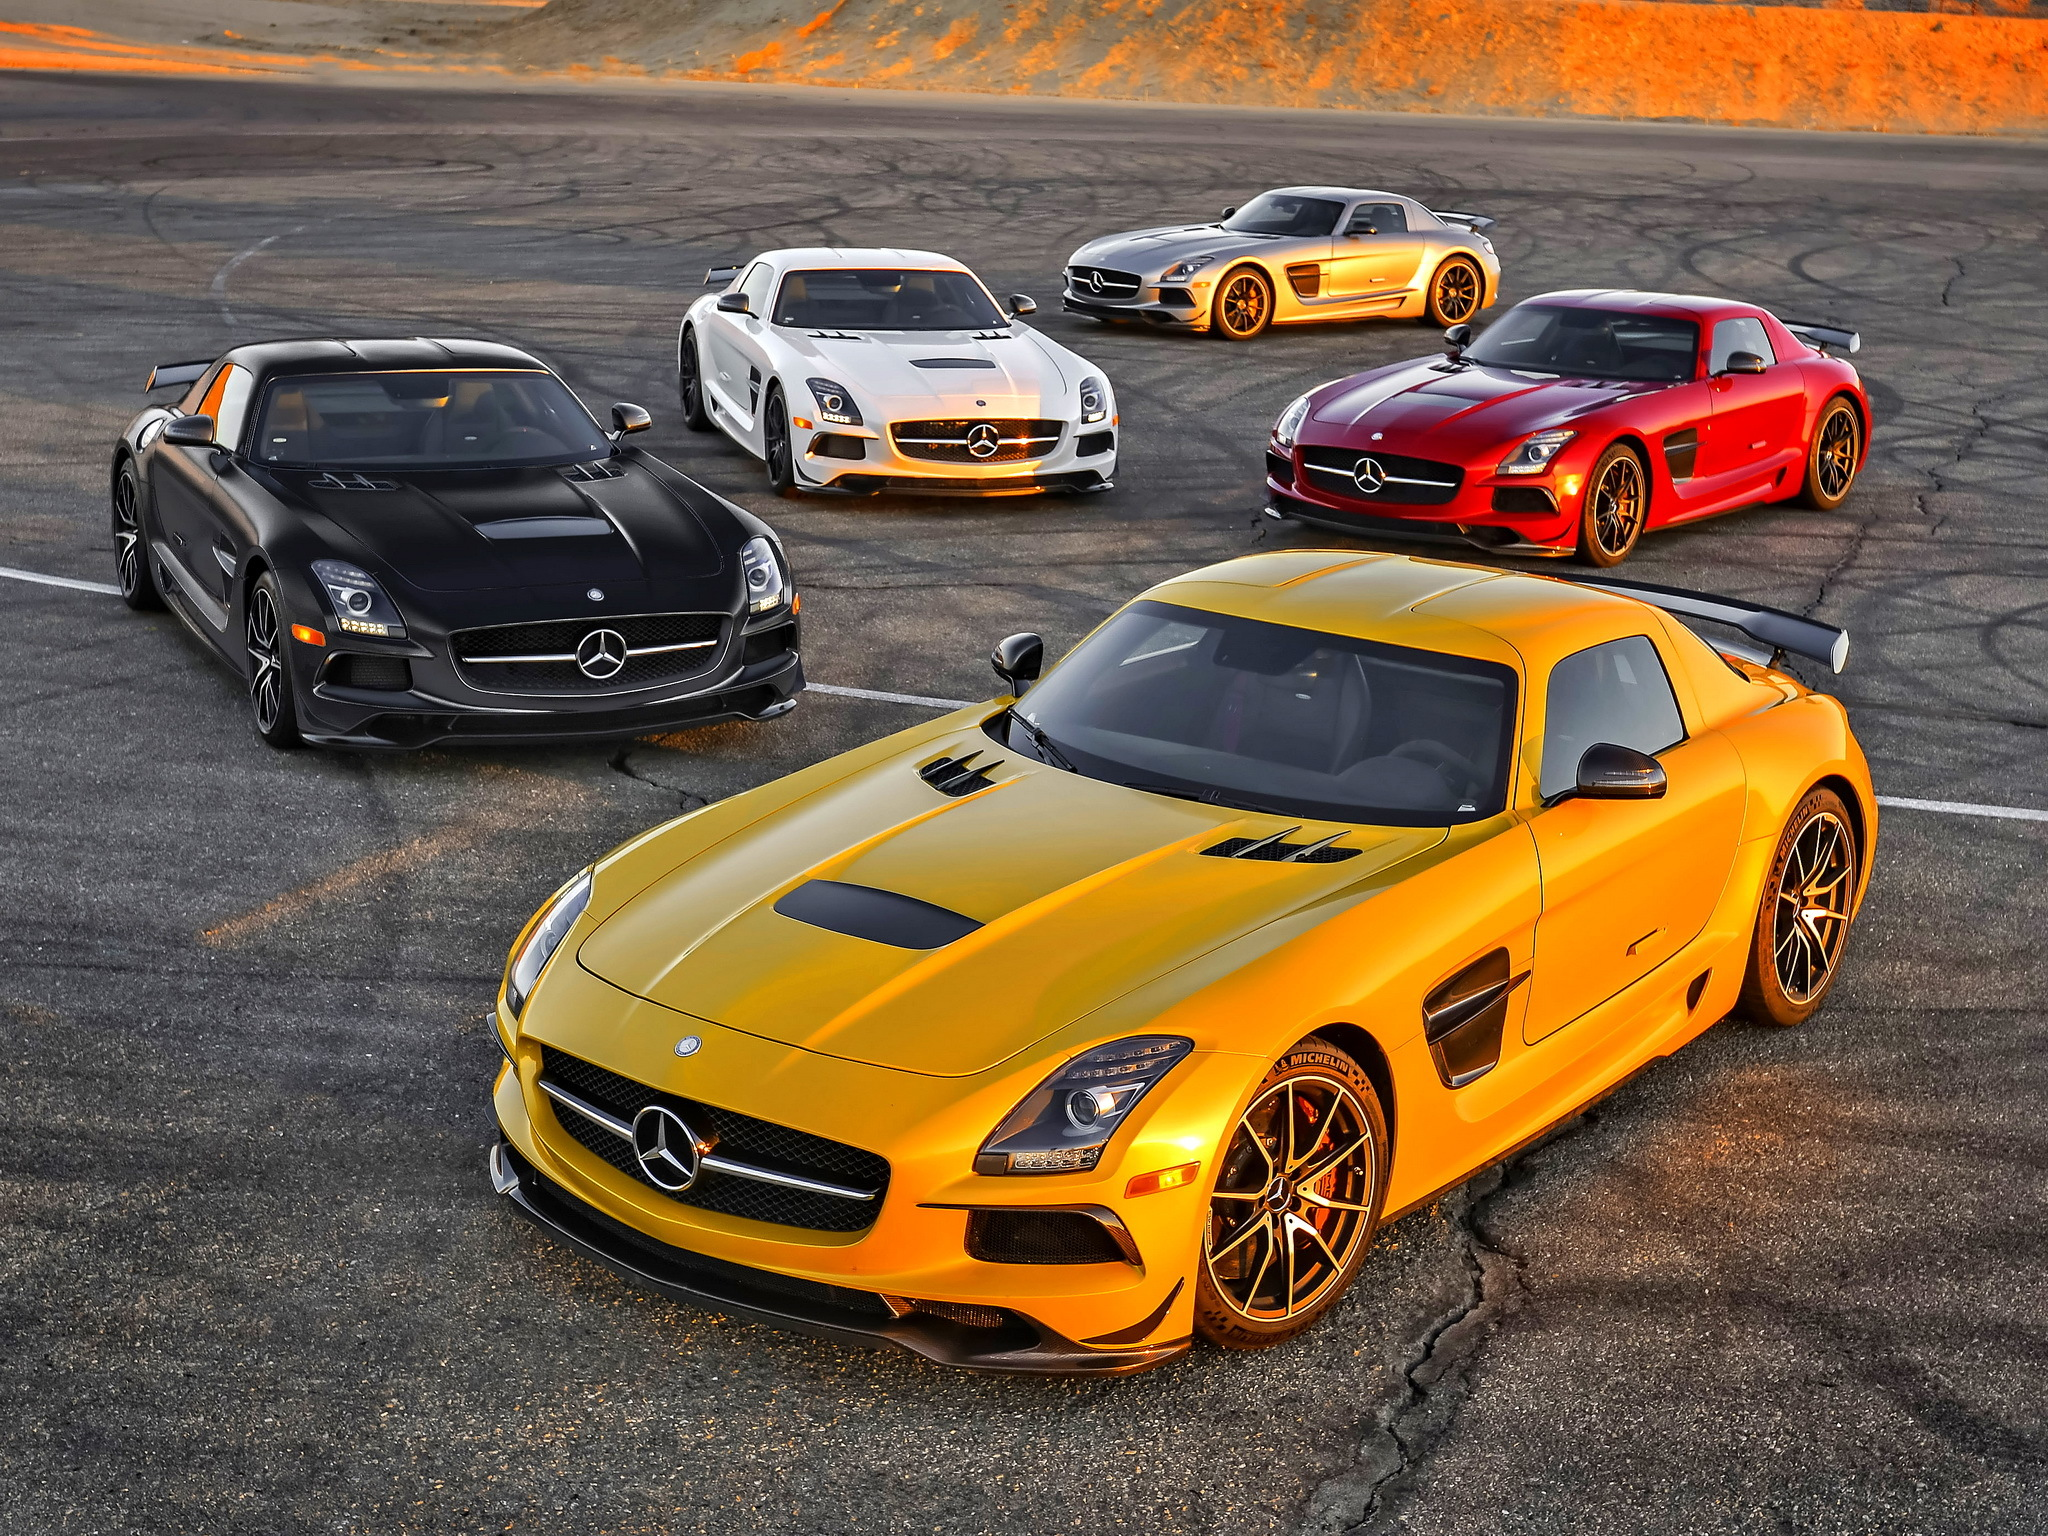 Mercedes Benz Sls Hd Wallpaper Background Image 2048x1536 Id